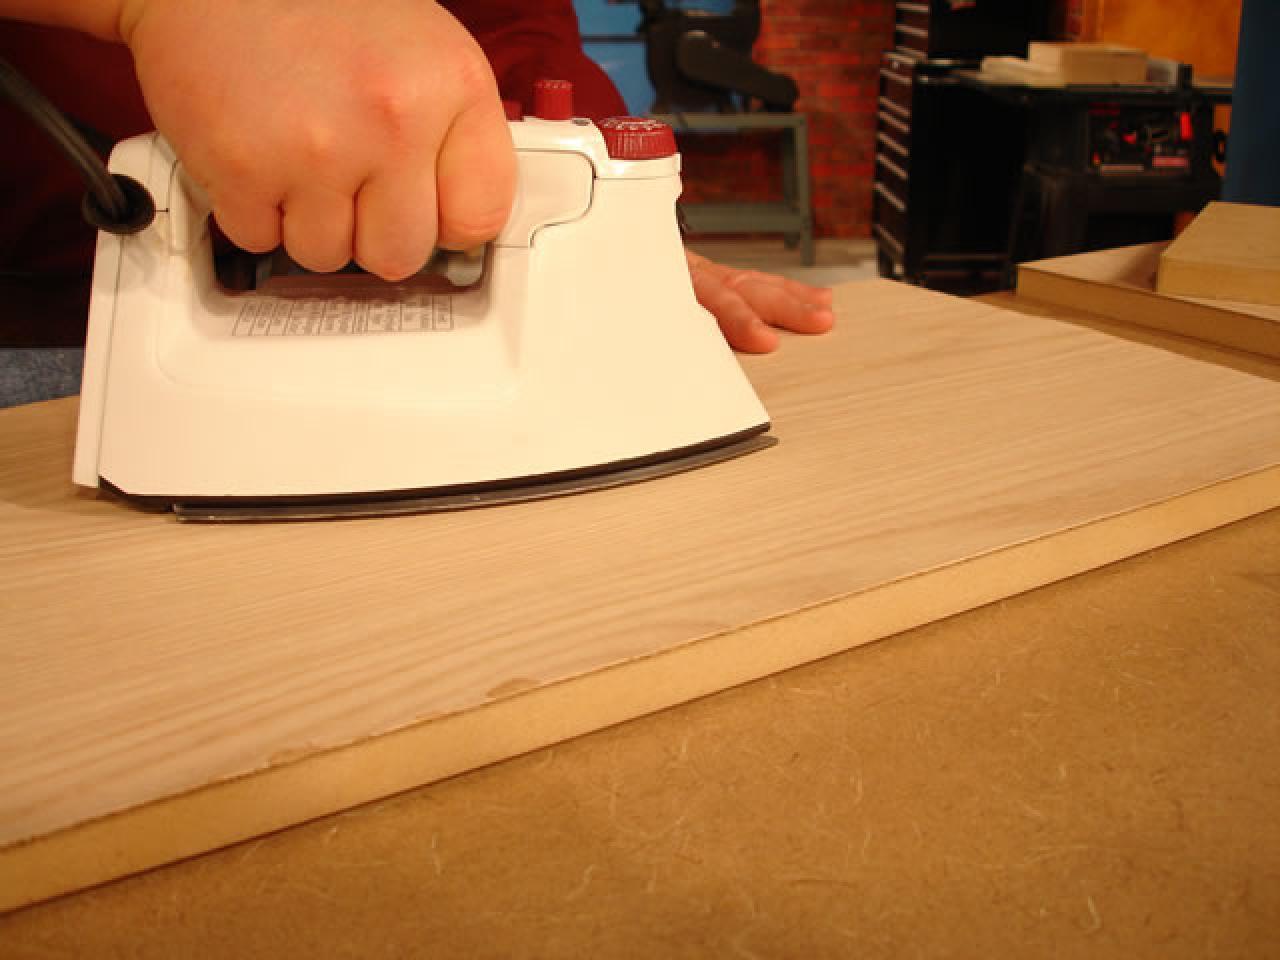 Veneer application tools diy use iron on high heat to melt adhesive on veneer solutioingenieria Gallery